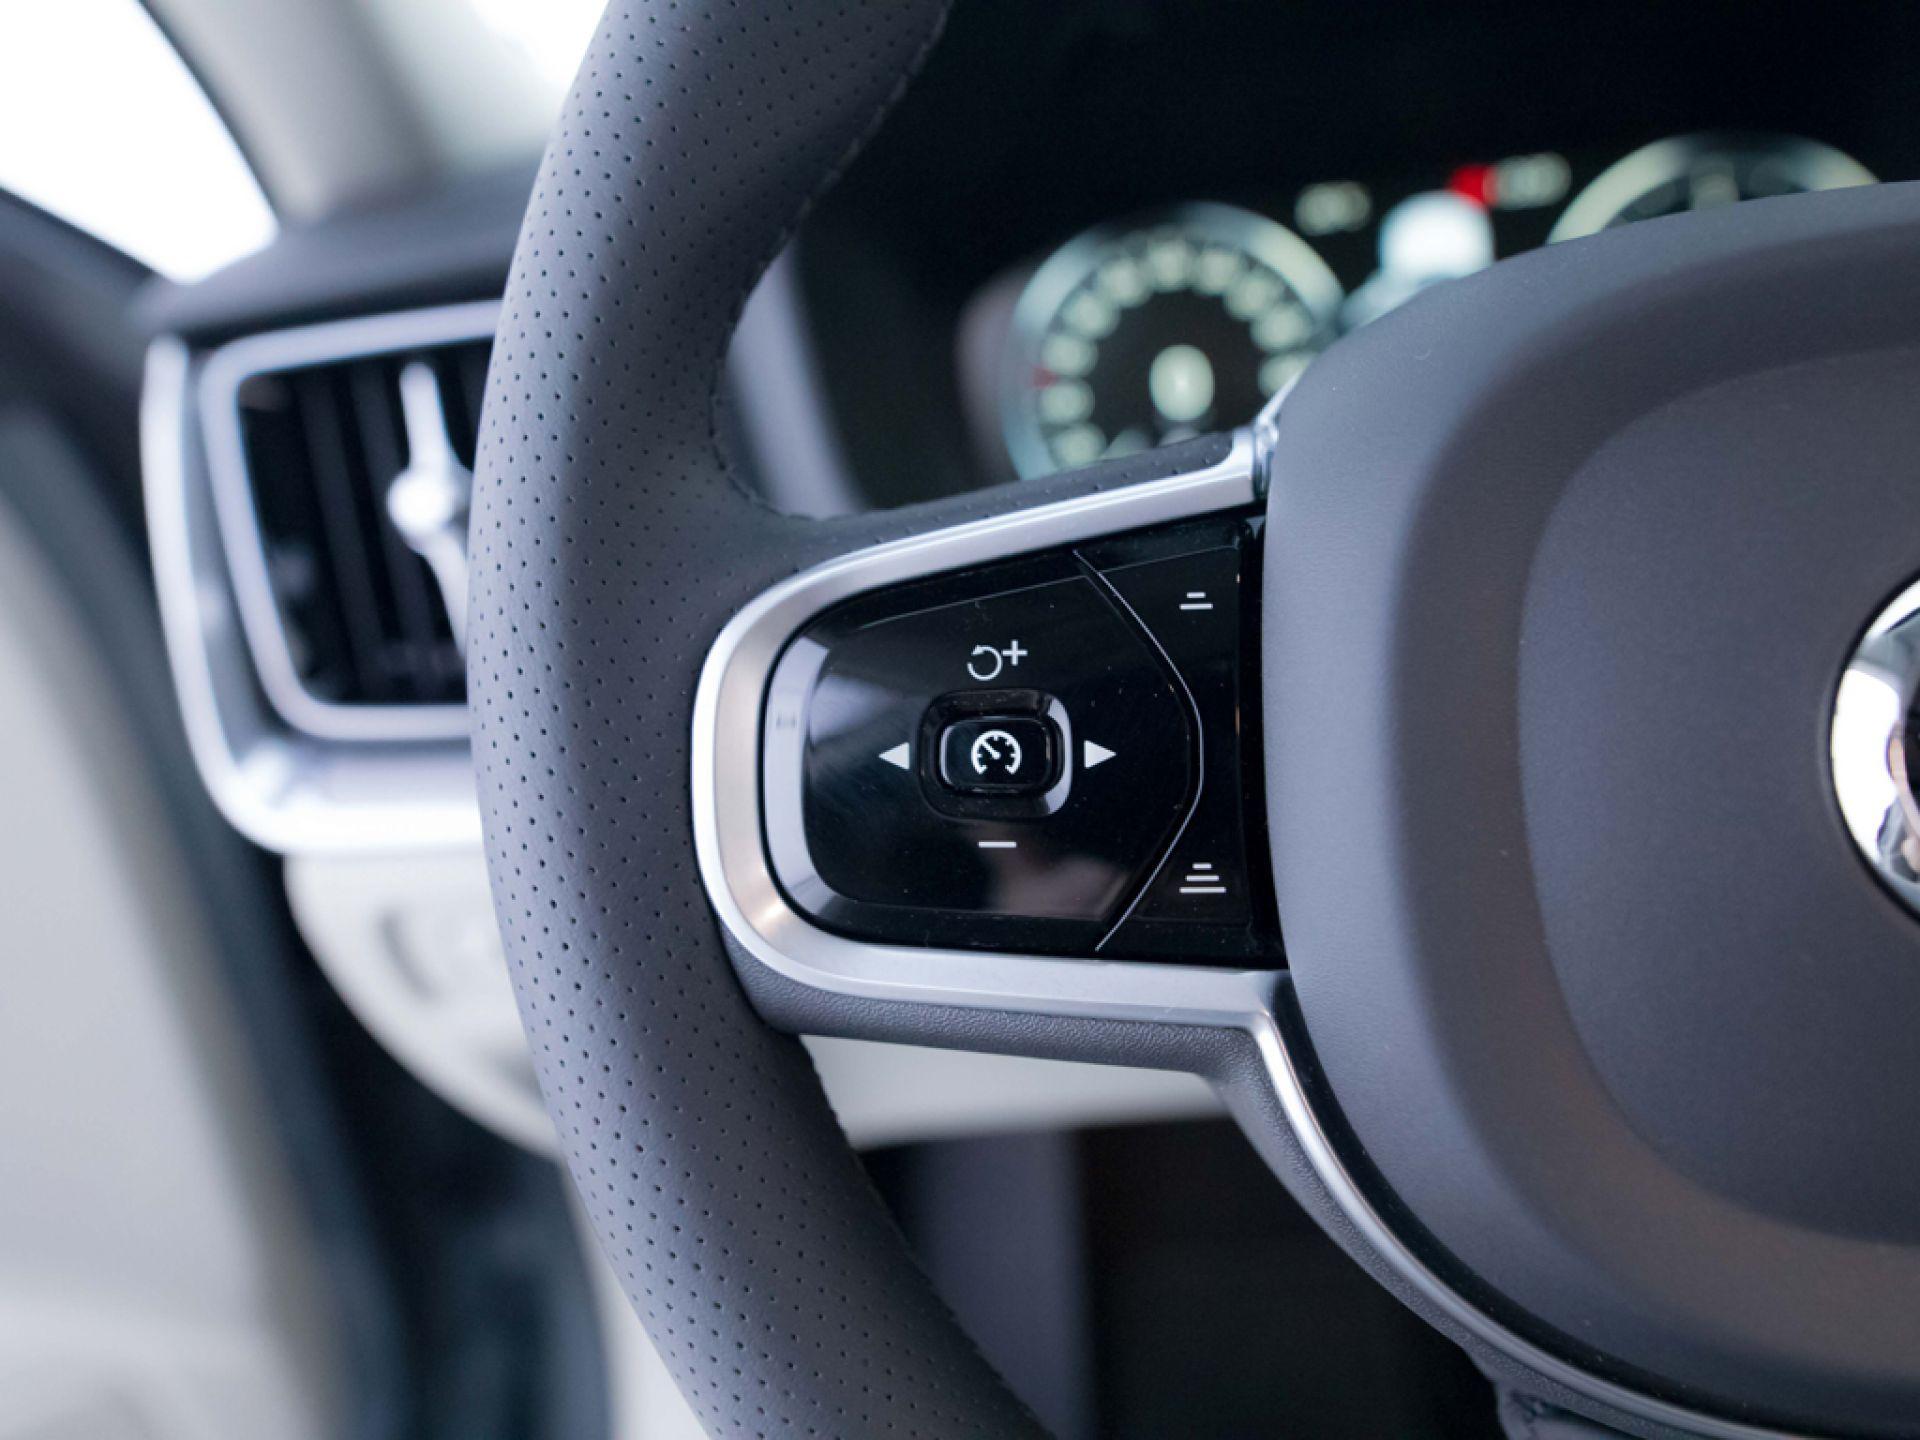 Volvo V60 2.0 D3 Inscription Auto